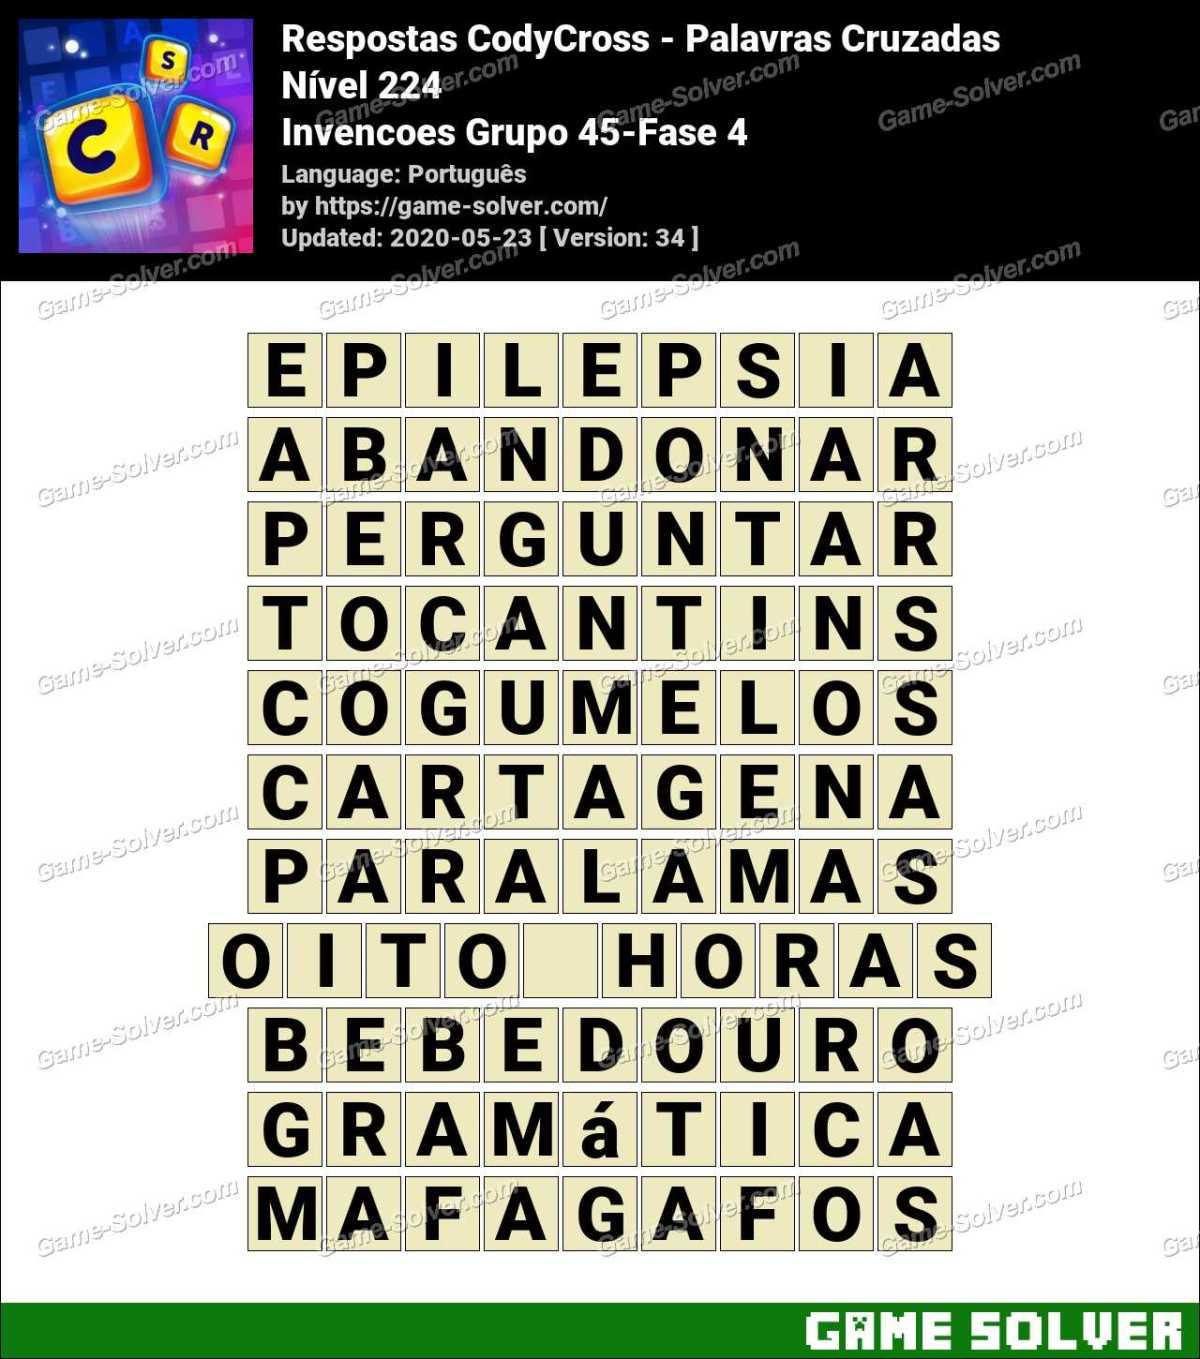 Respostas CodyCross Invencoes Grupo 45-Fase 4